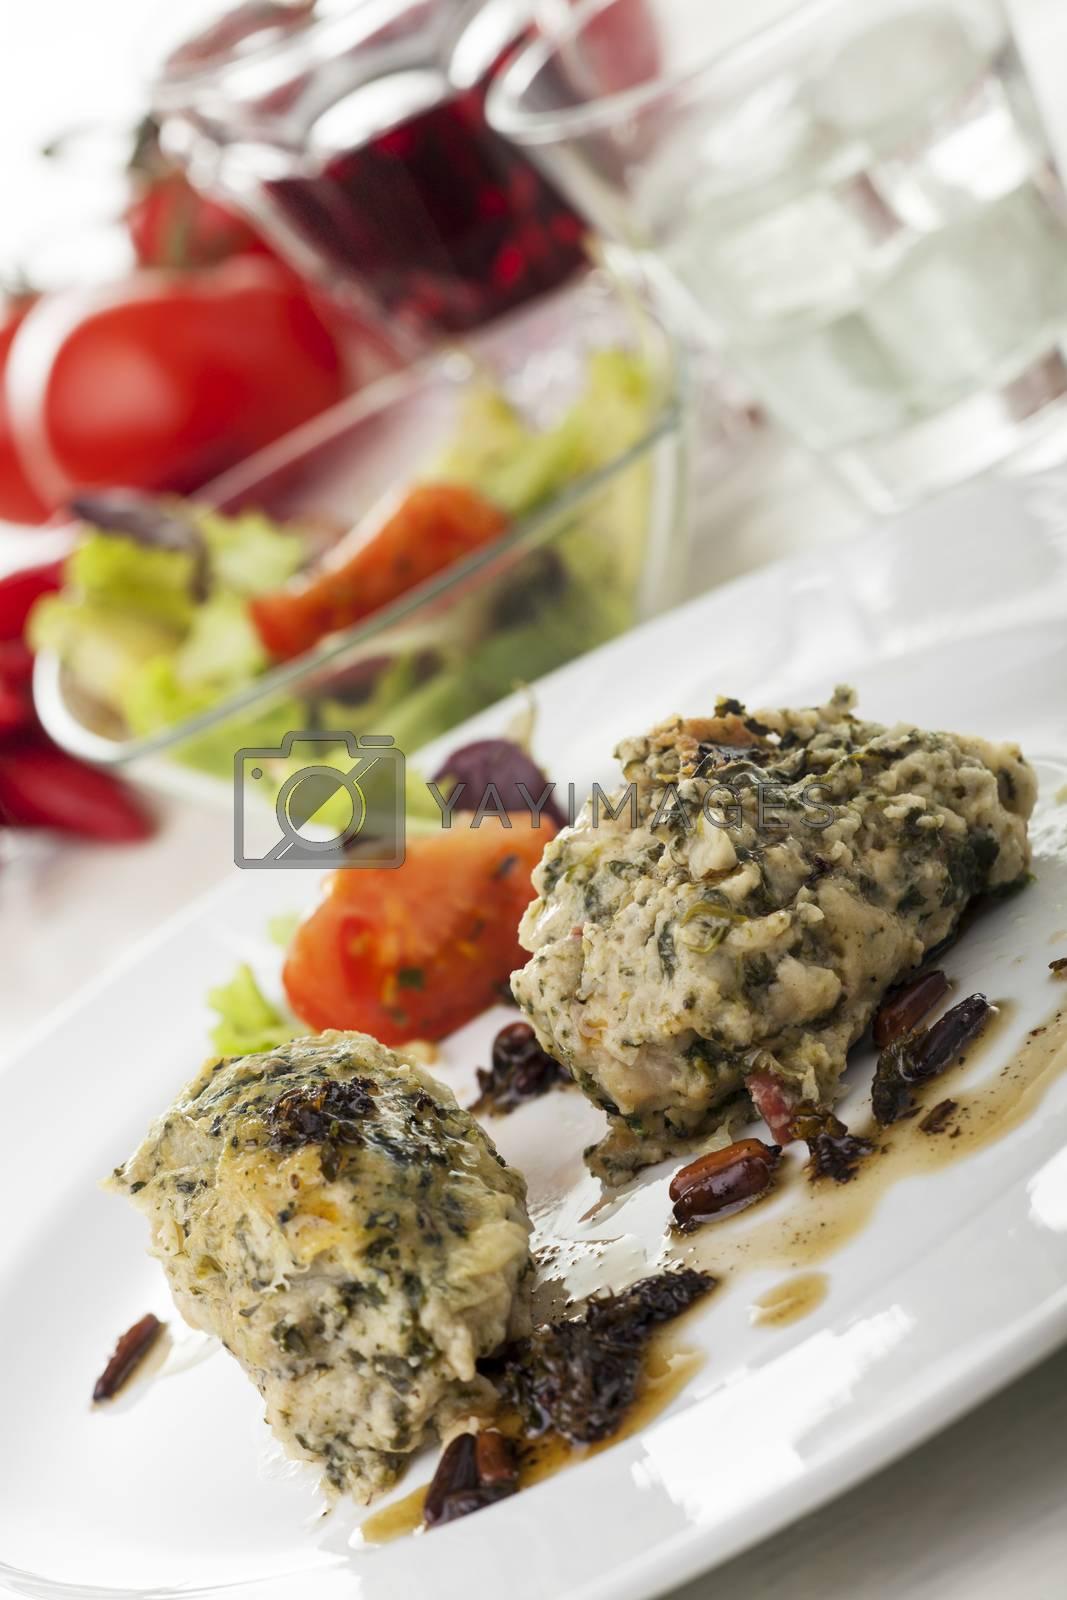 italian strangolapreti dumplings on a plate by bernjuer